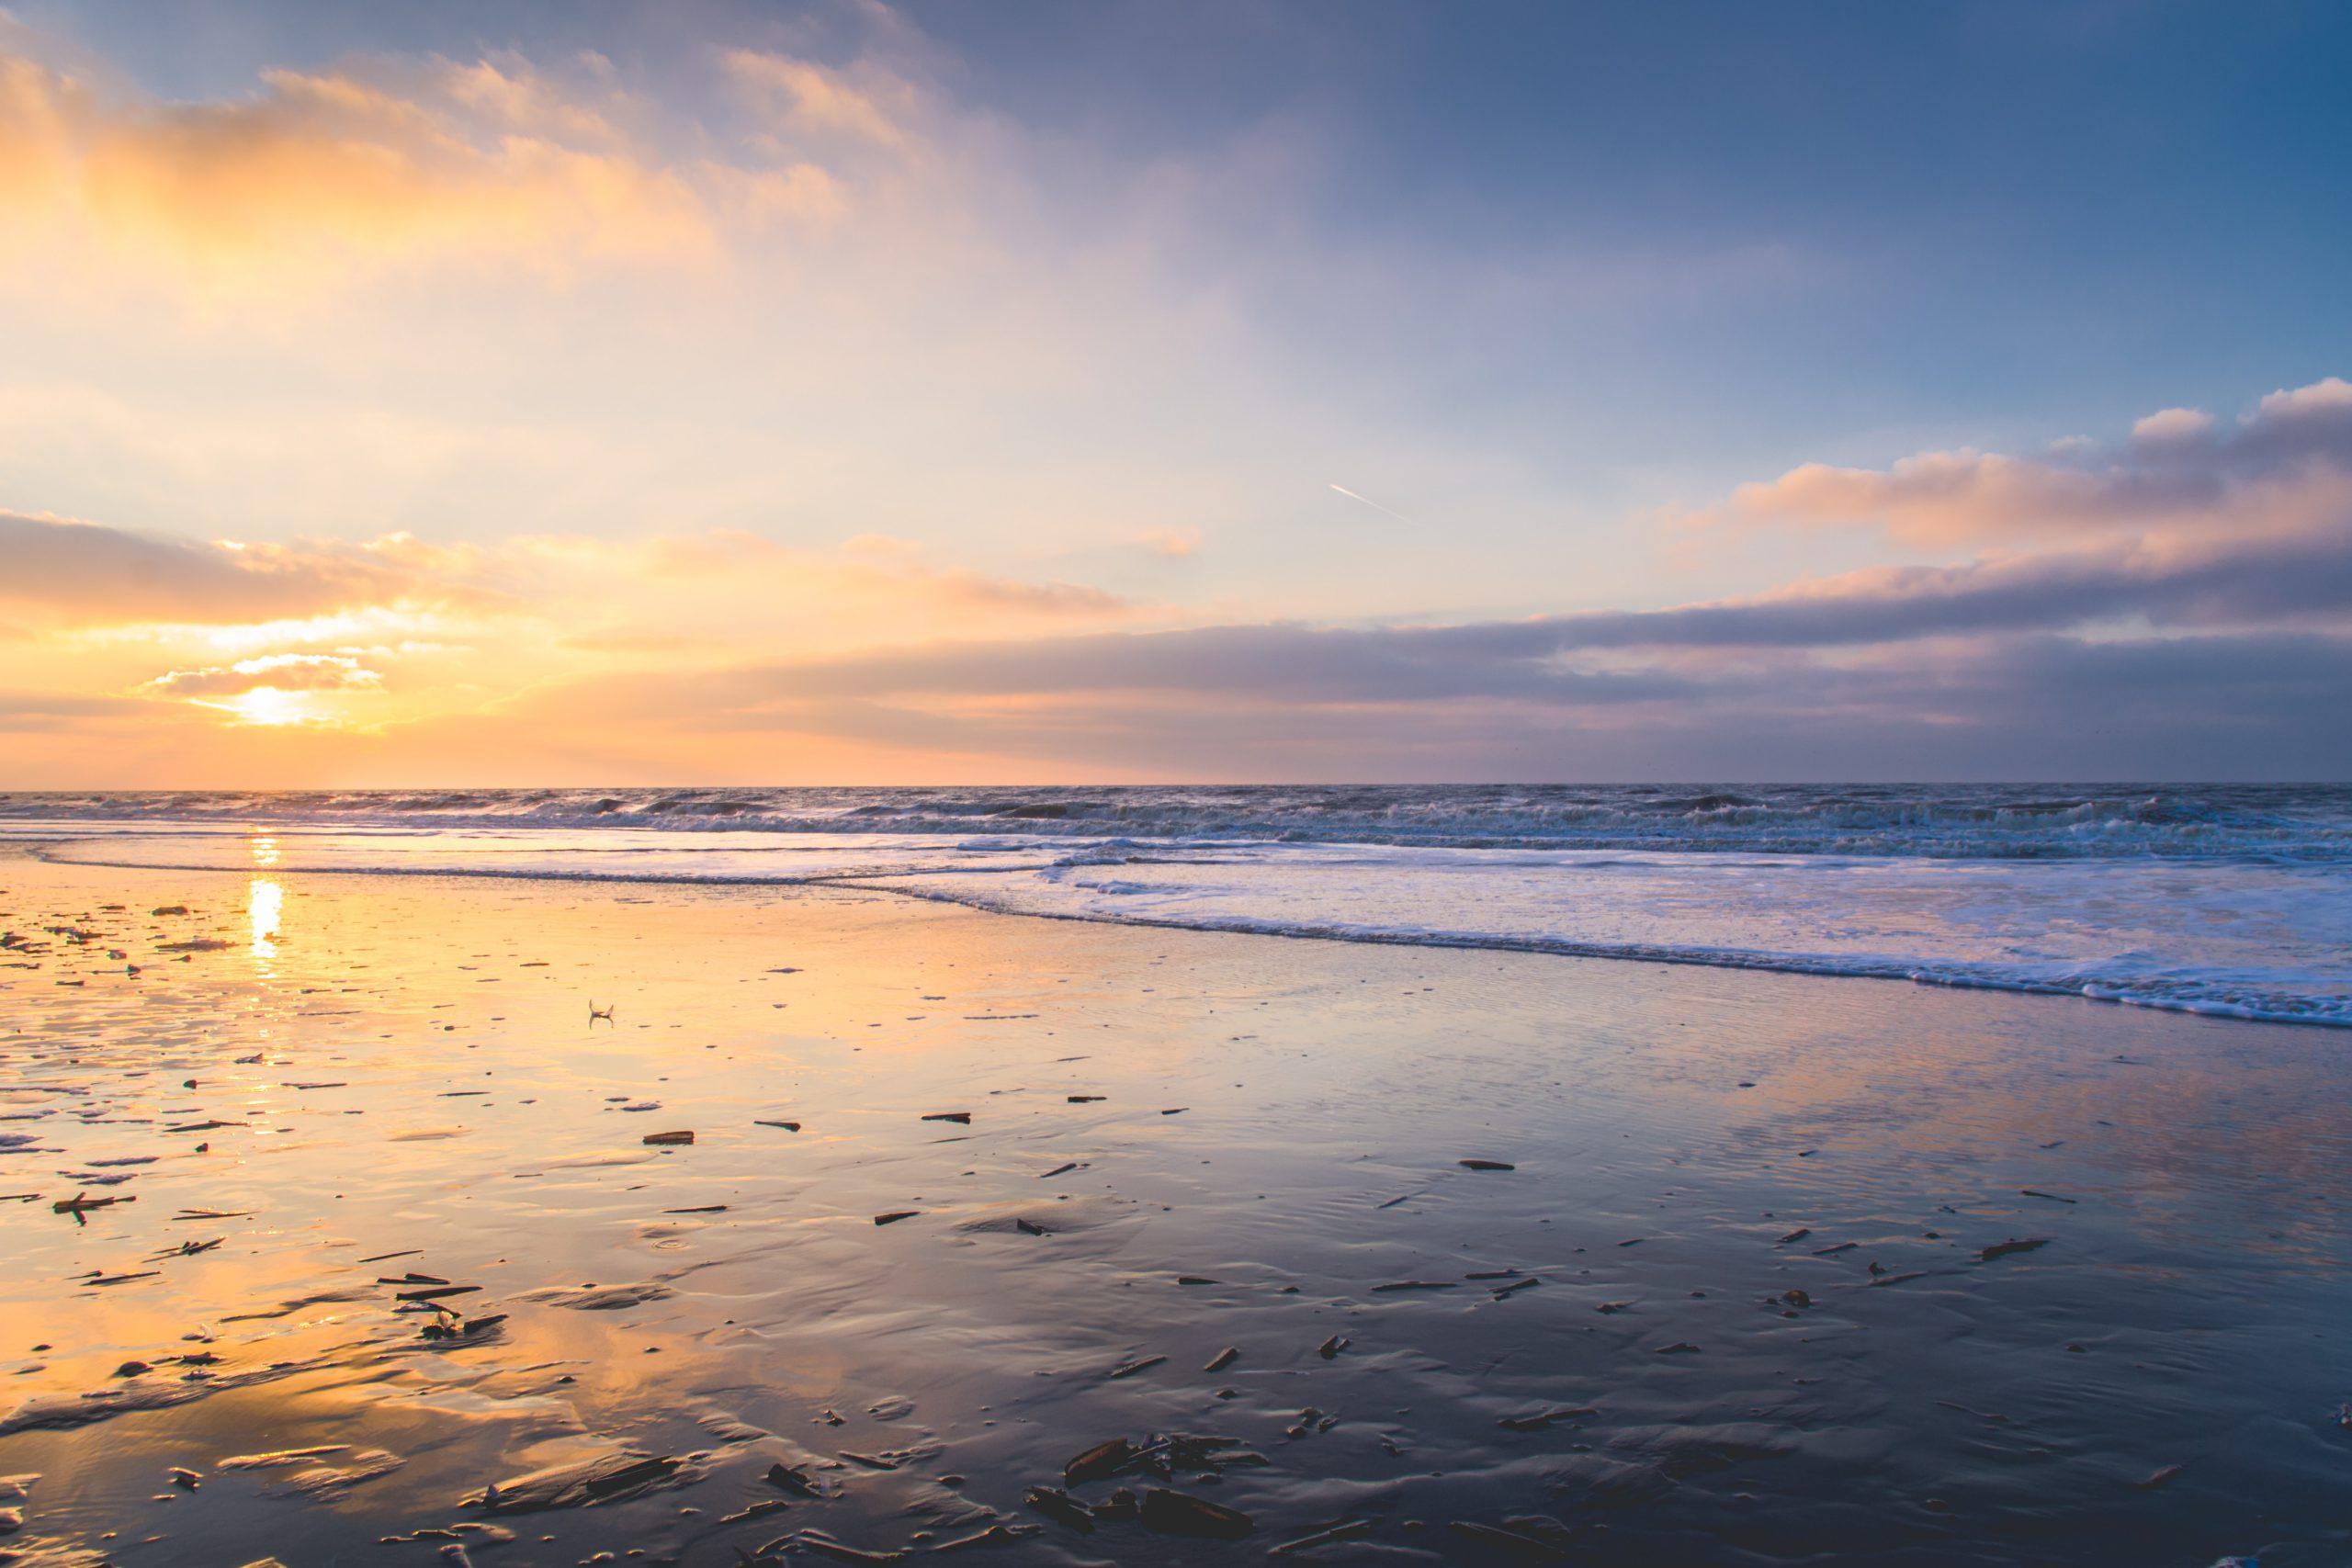 Strand-zuid-holland